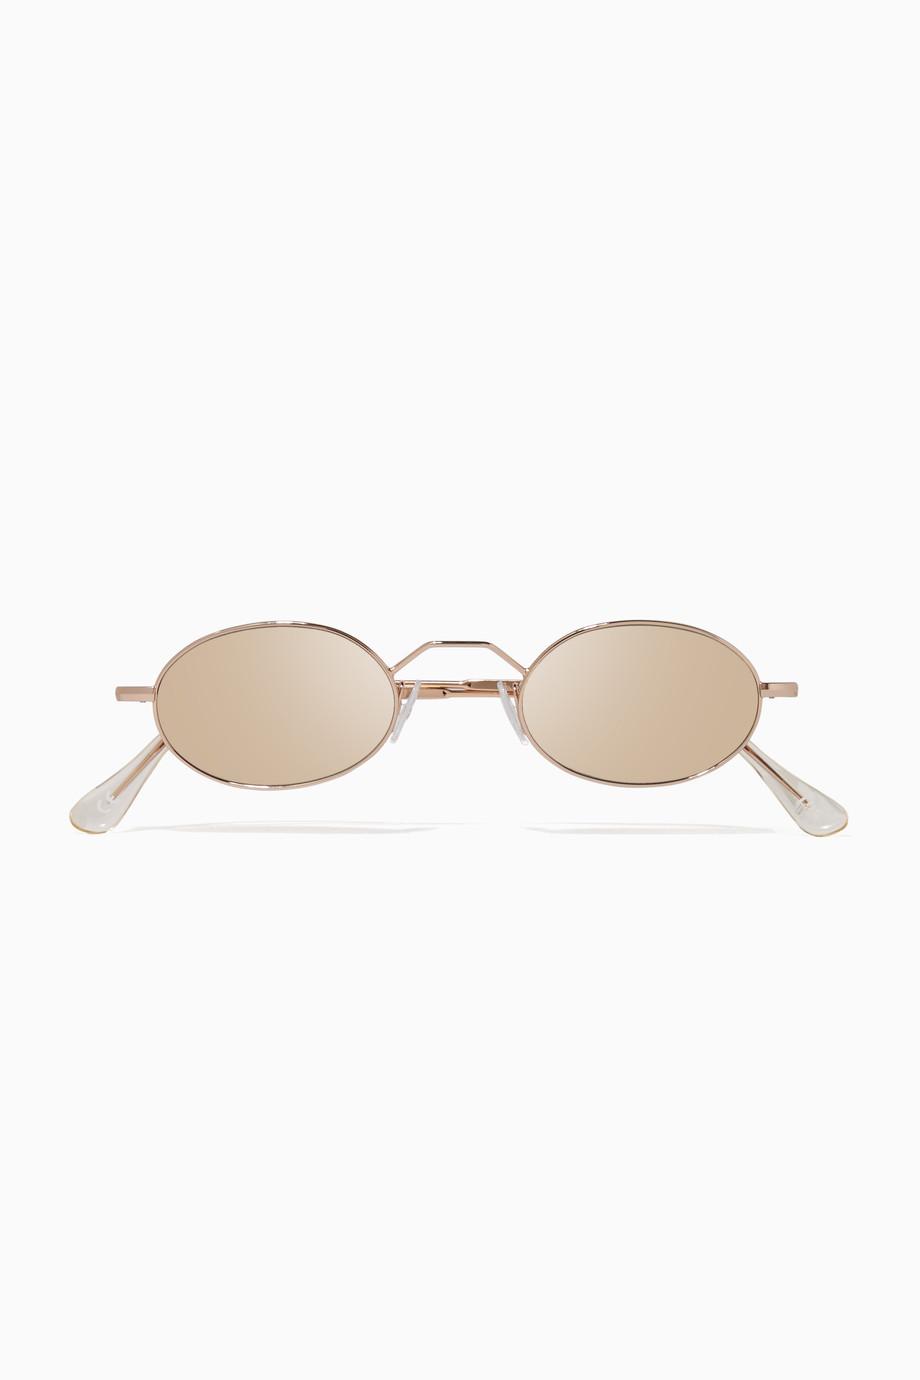 eae5f6b25 تسوق نظارة شمسية أرمسترونغ بعينين بيضاويتين باللون الذهبي اندي وولف ...